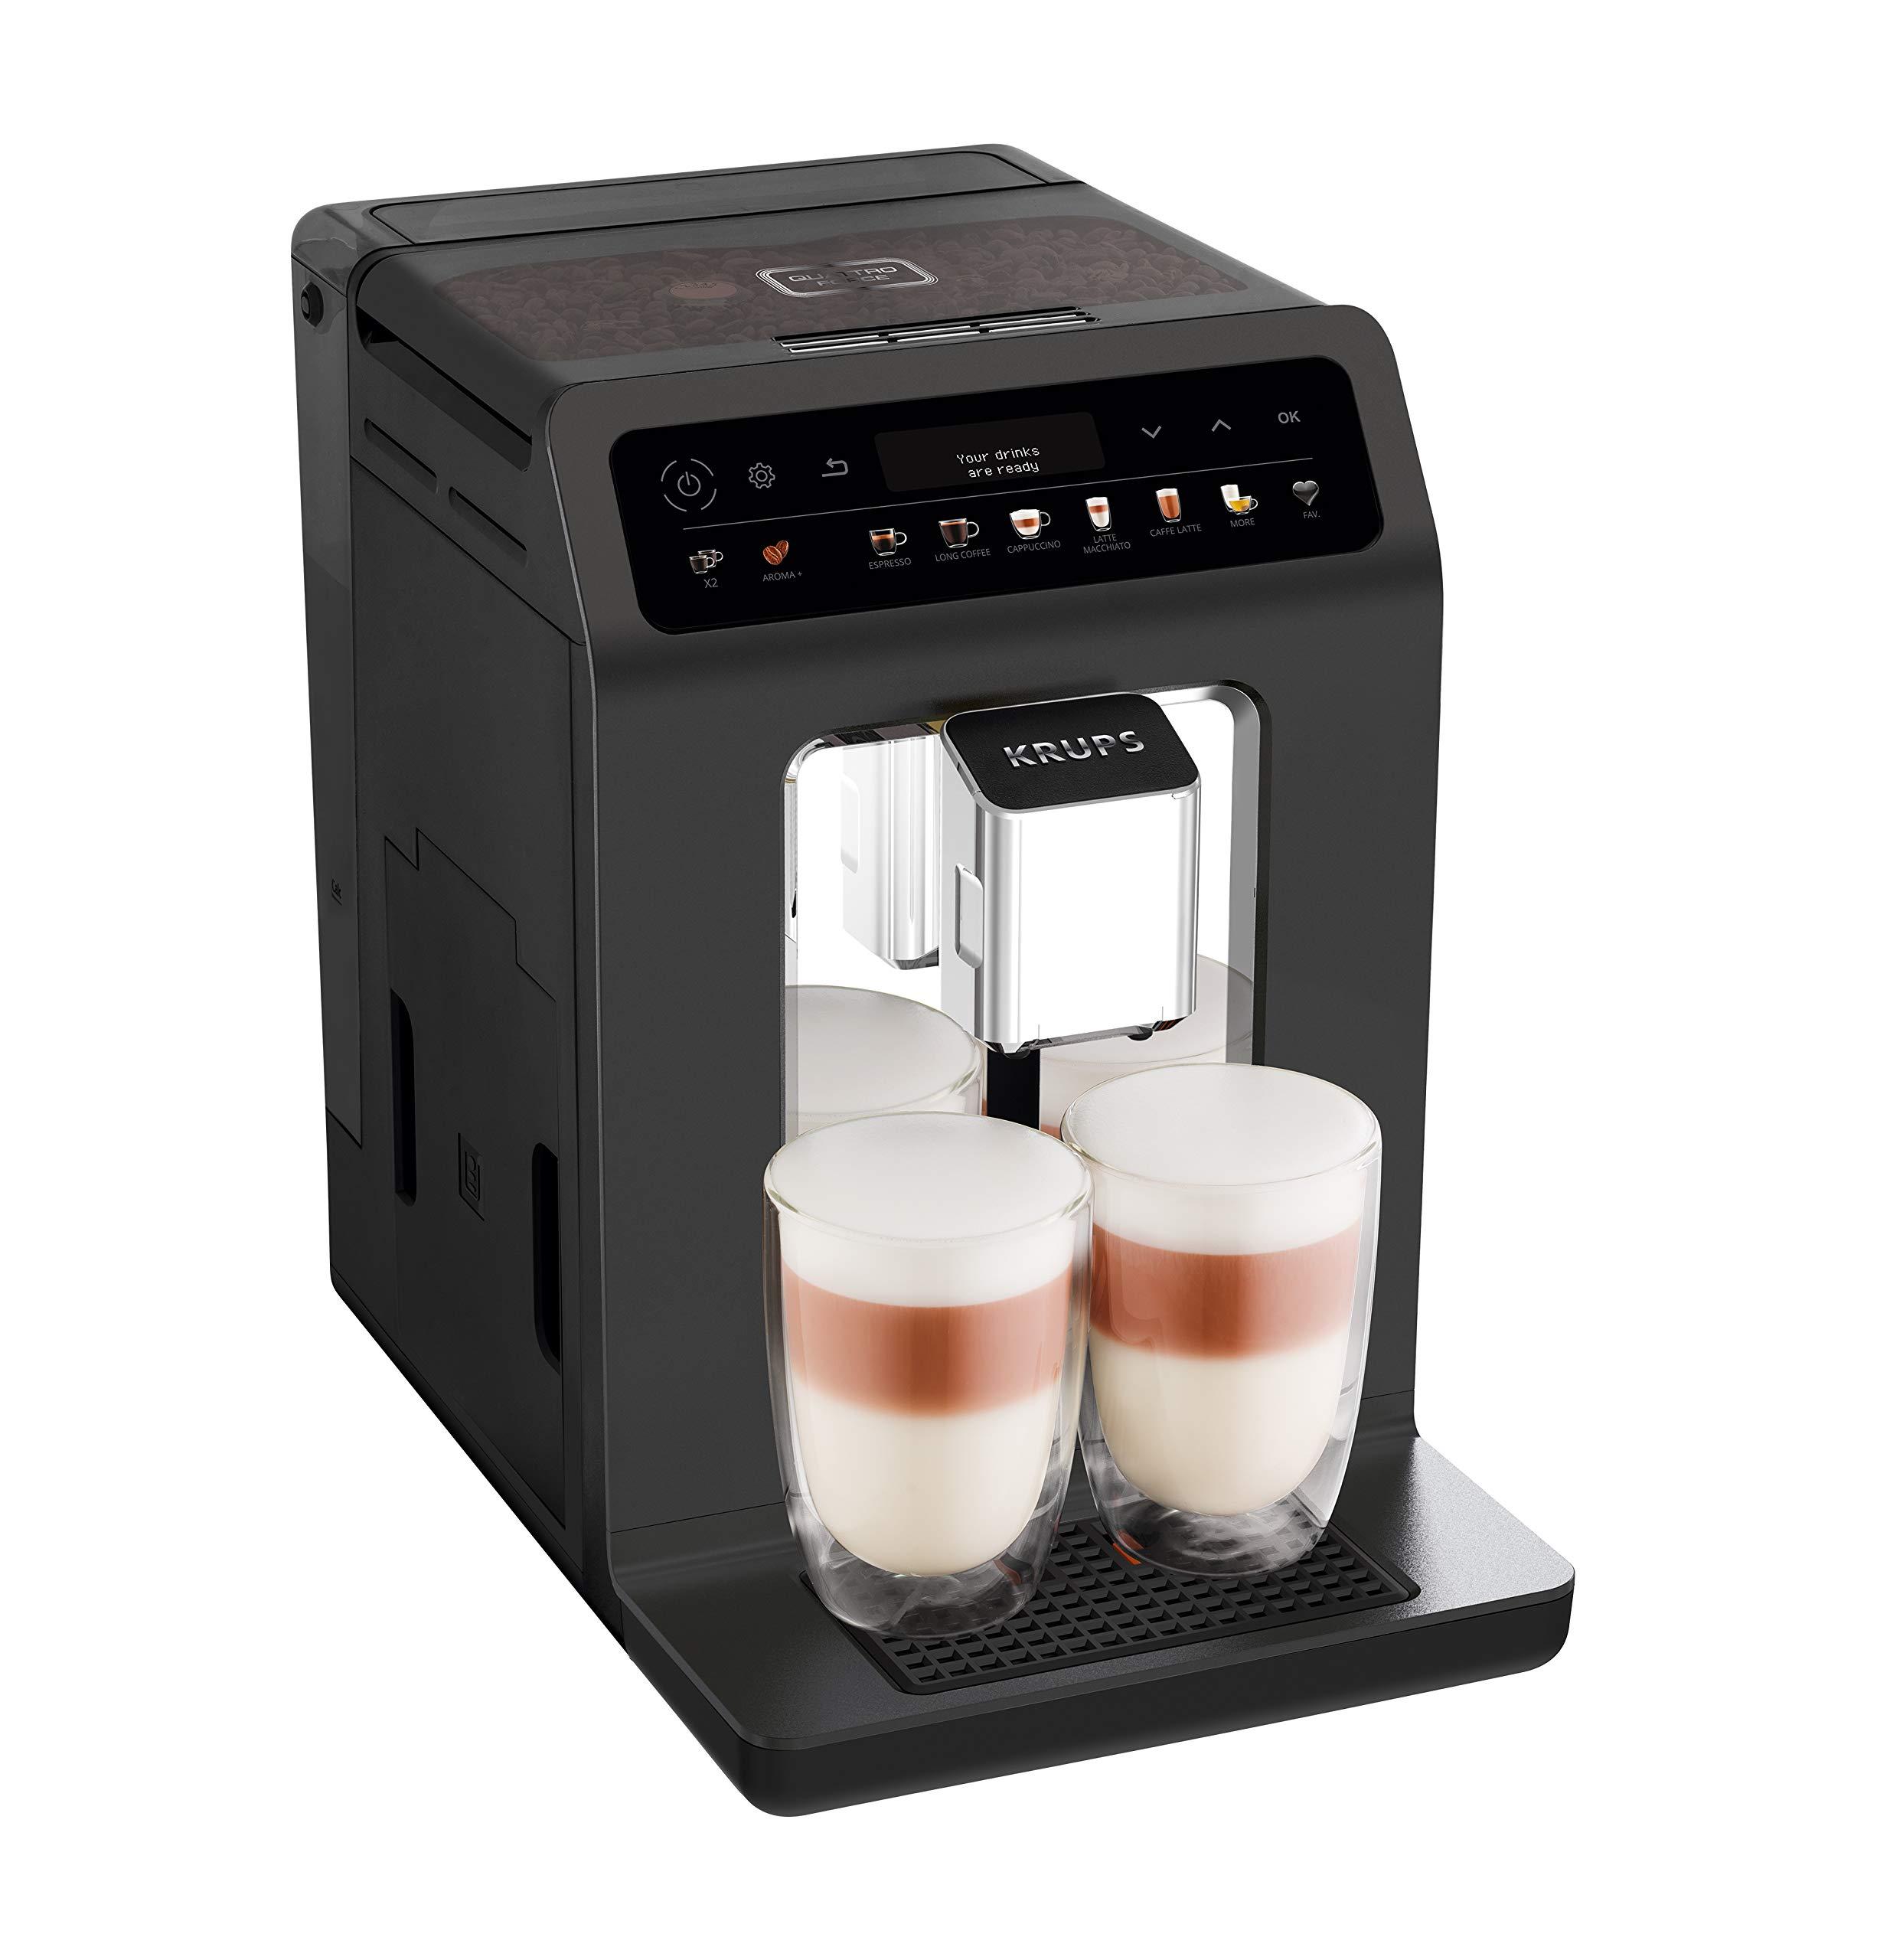 Krups-EA895N-Evidence-One-Kaffeevollautomat-1450-Watt-Doppel-Tassen-Funktion-One-Touch-Cappuccino-Bohnenbehlter-260-g-Wassertank-23-Liter-meteor-graphit